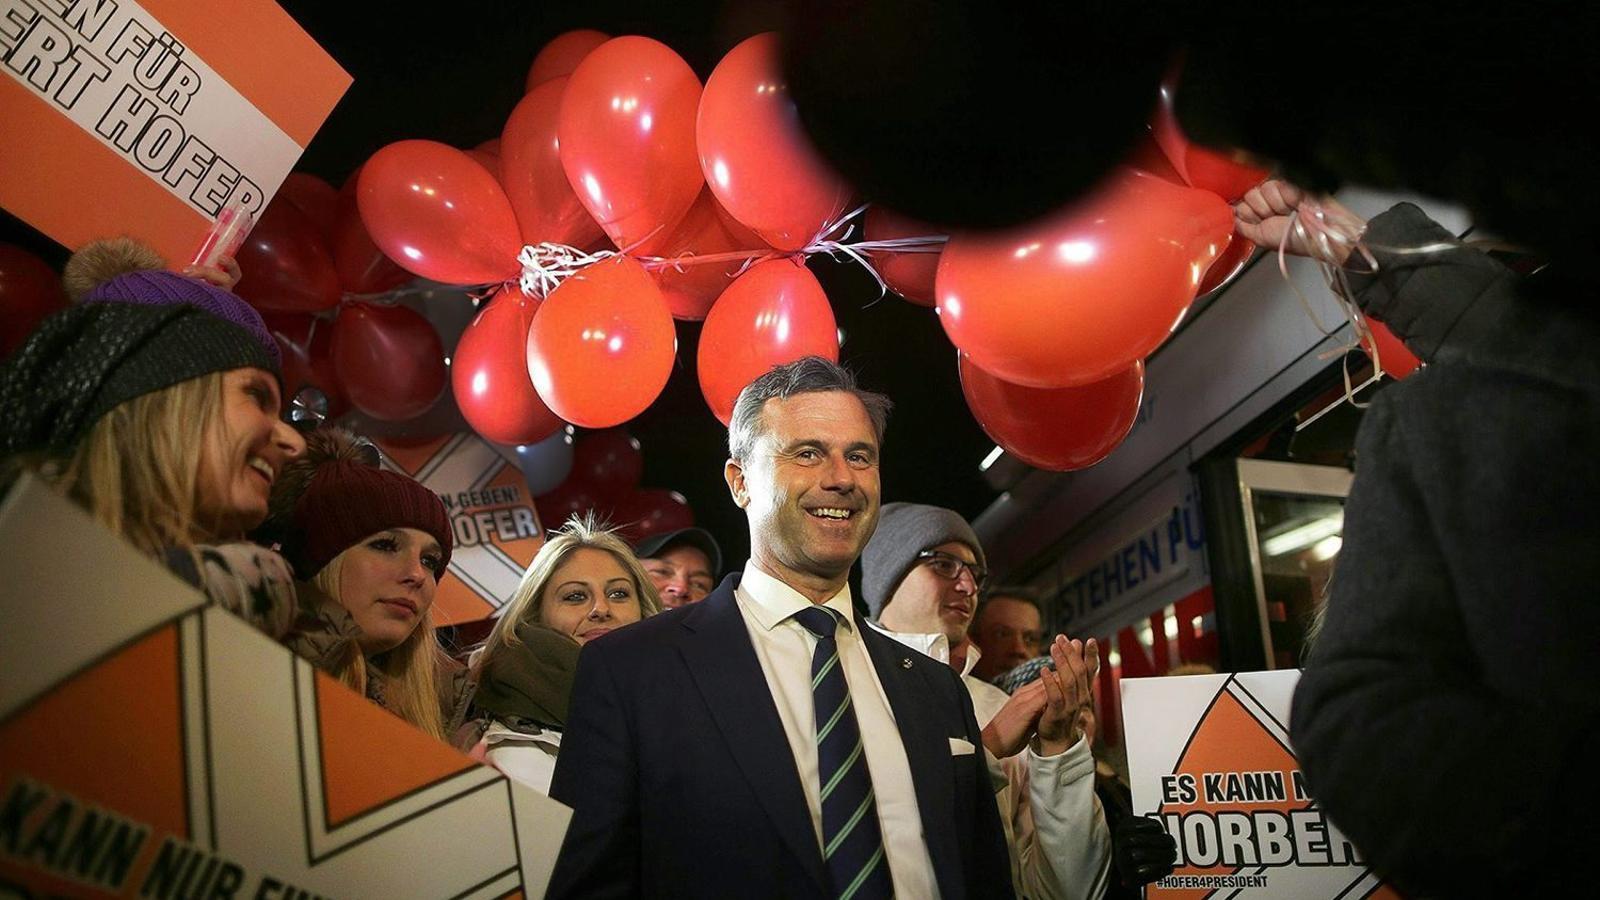 Àustria vota avui si fa president un populista de dretes